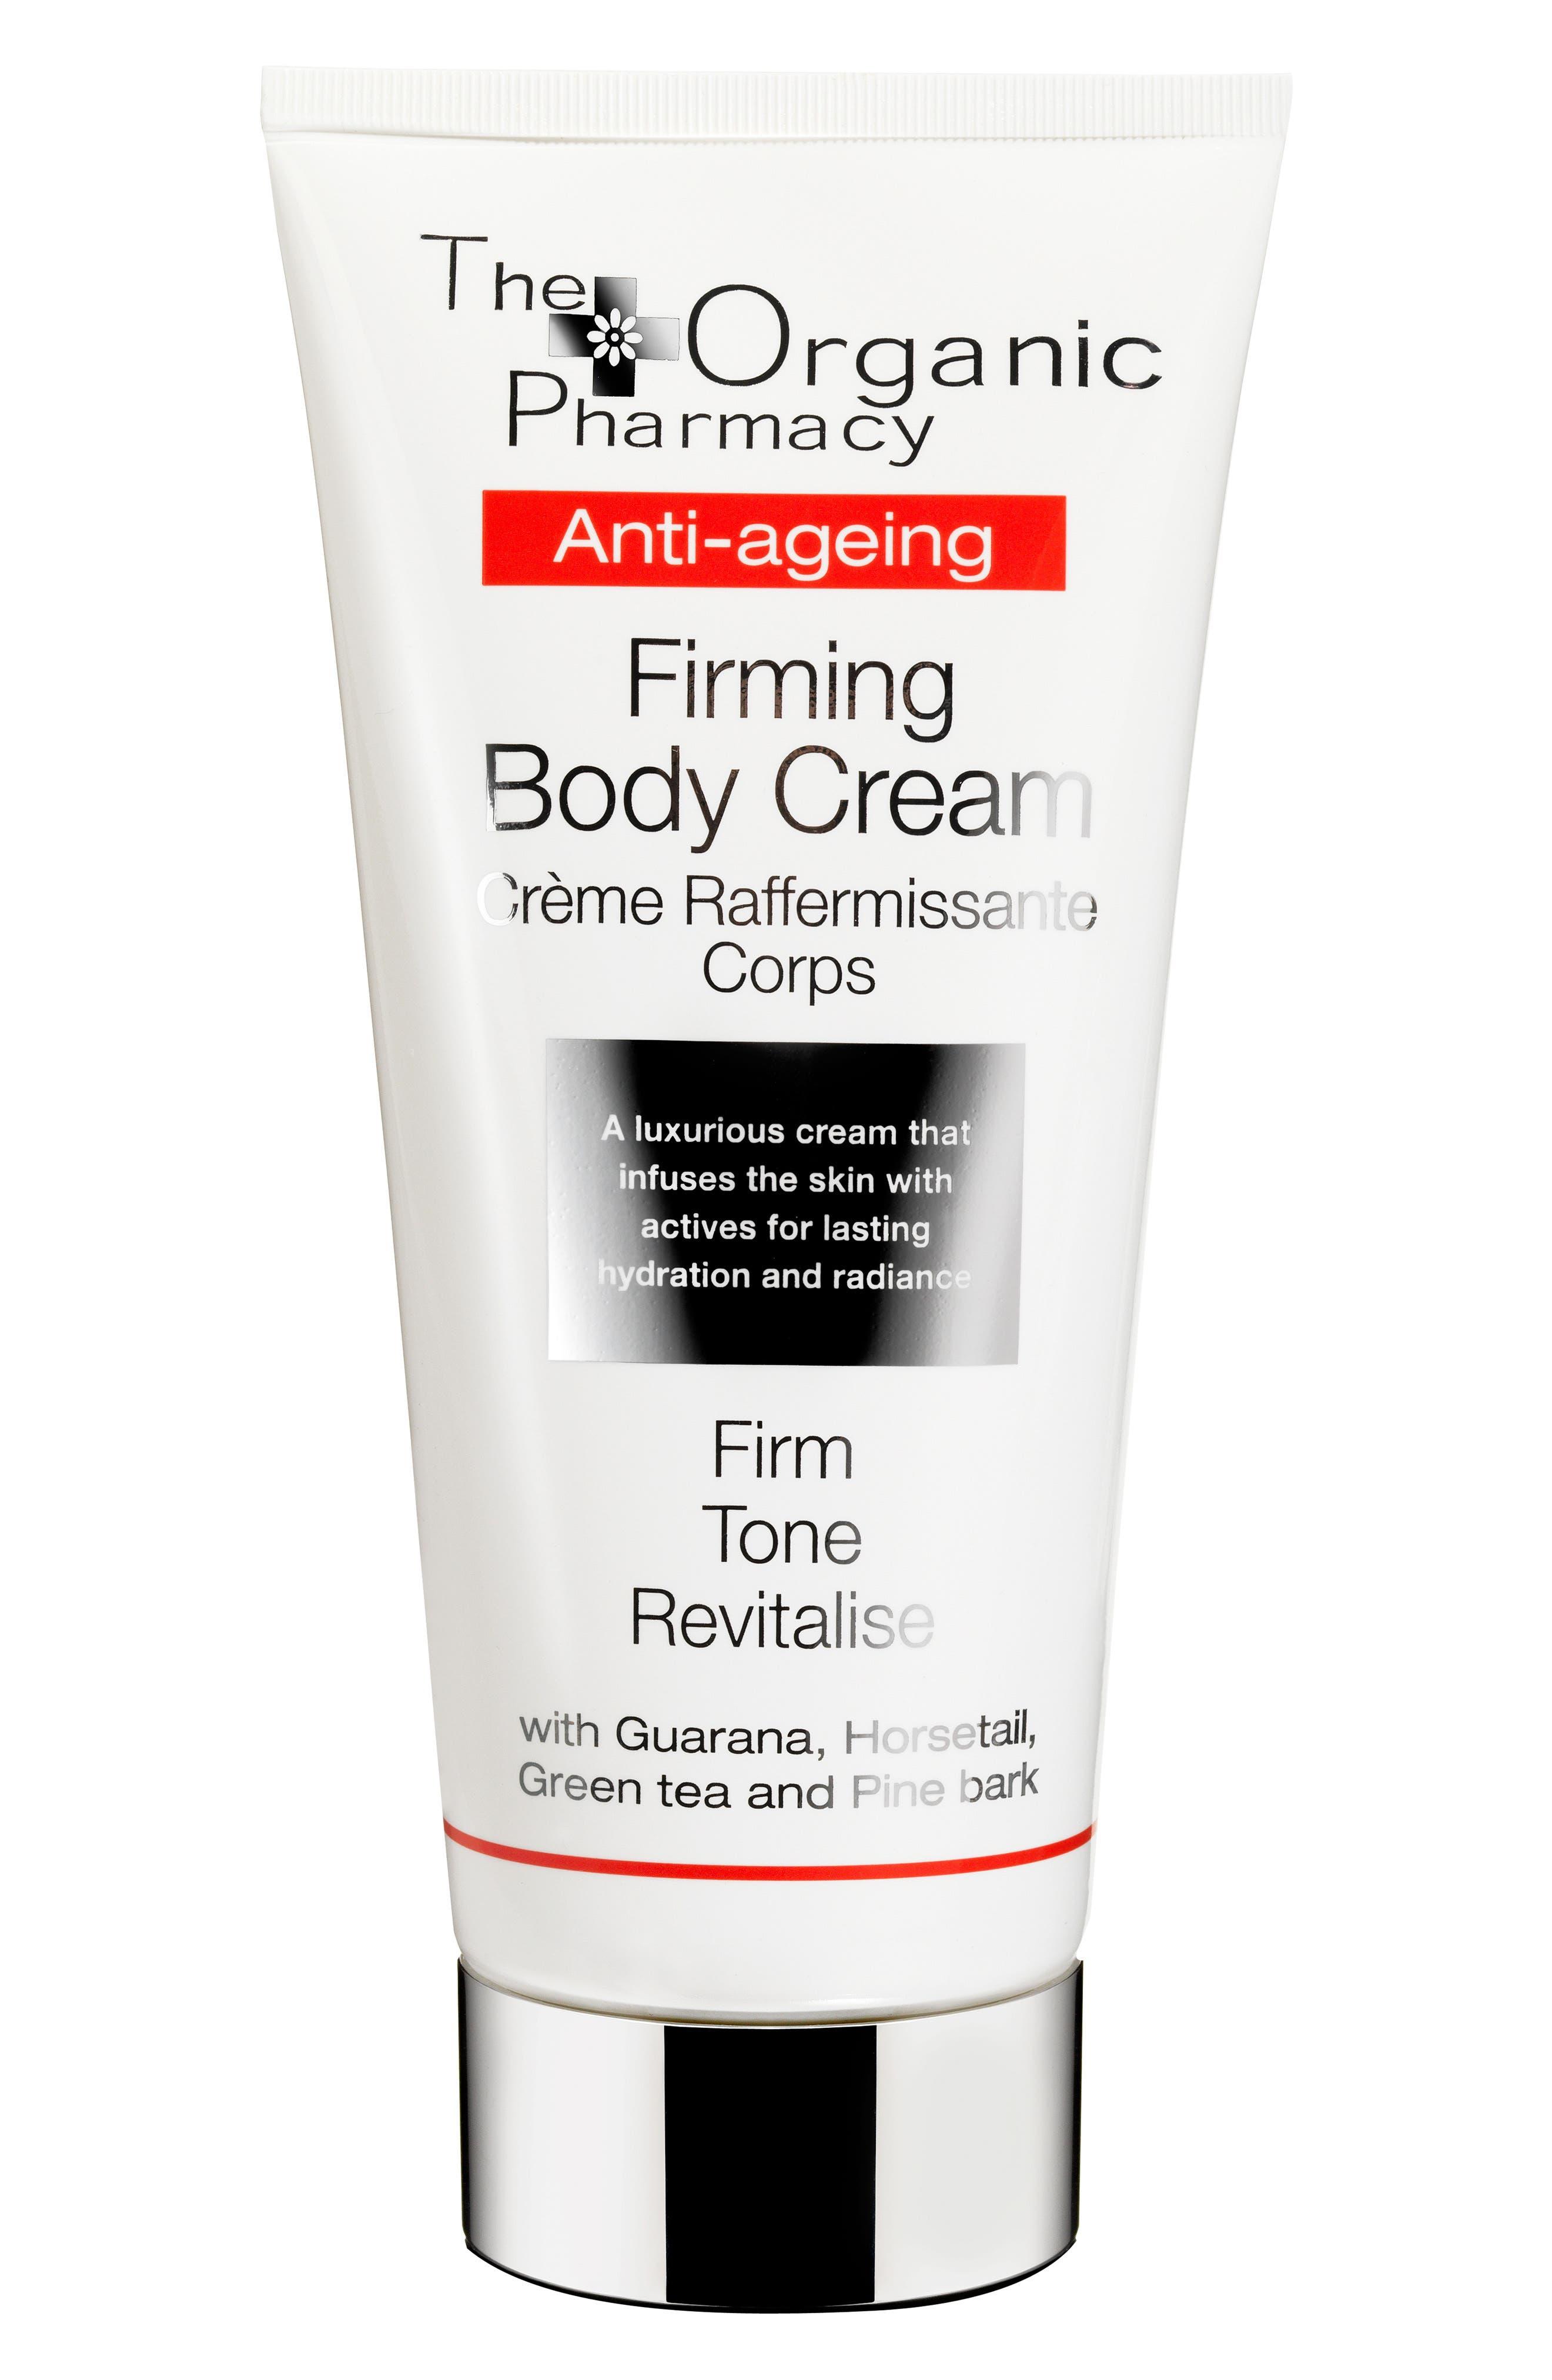 The Organic Pharmacy Anti-Aging Firming Body Cream